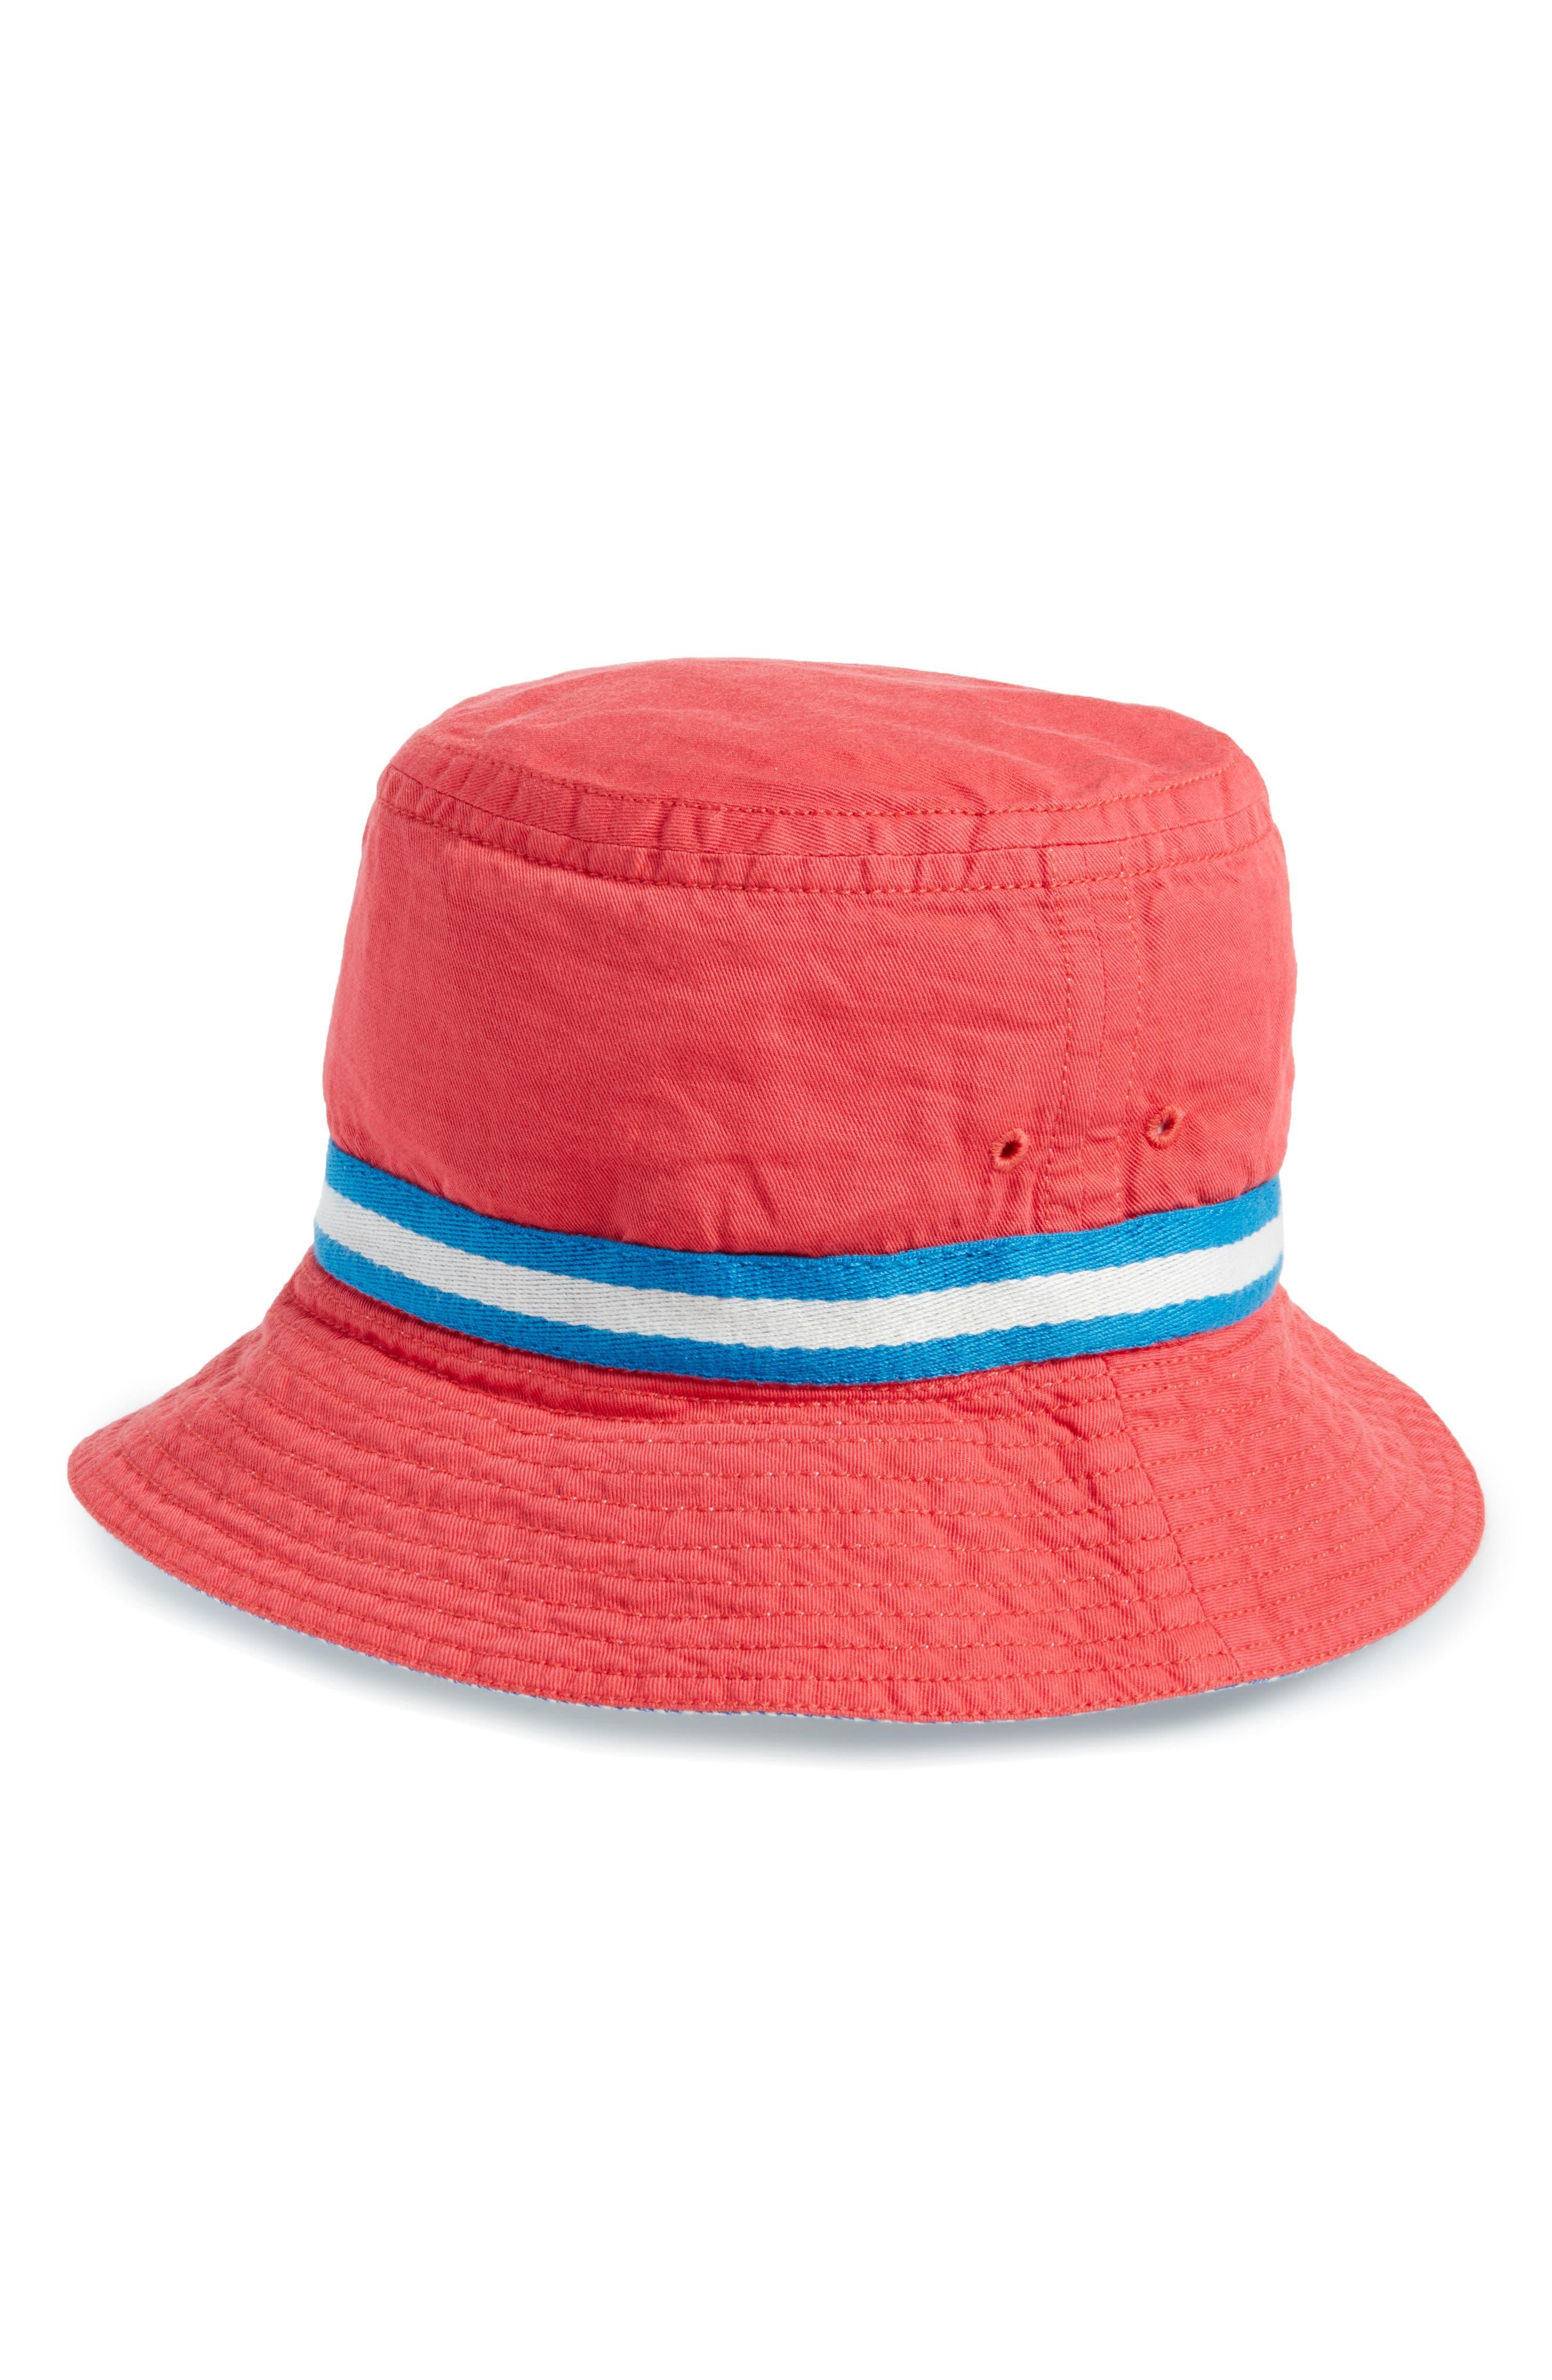 Fisherman's Hat,                         Main,                         color, Jam Red